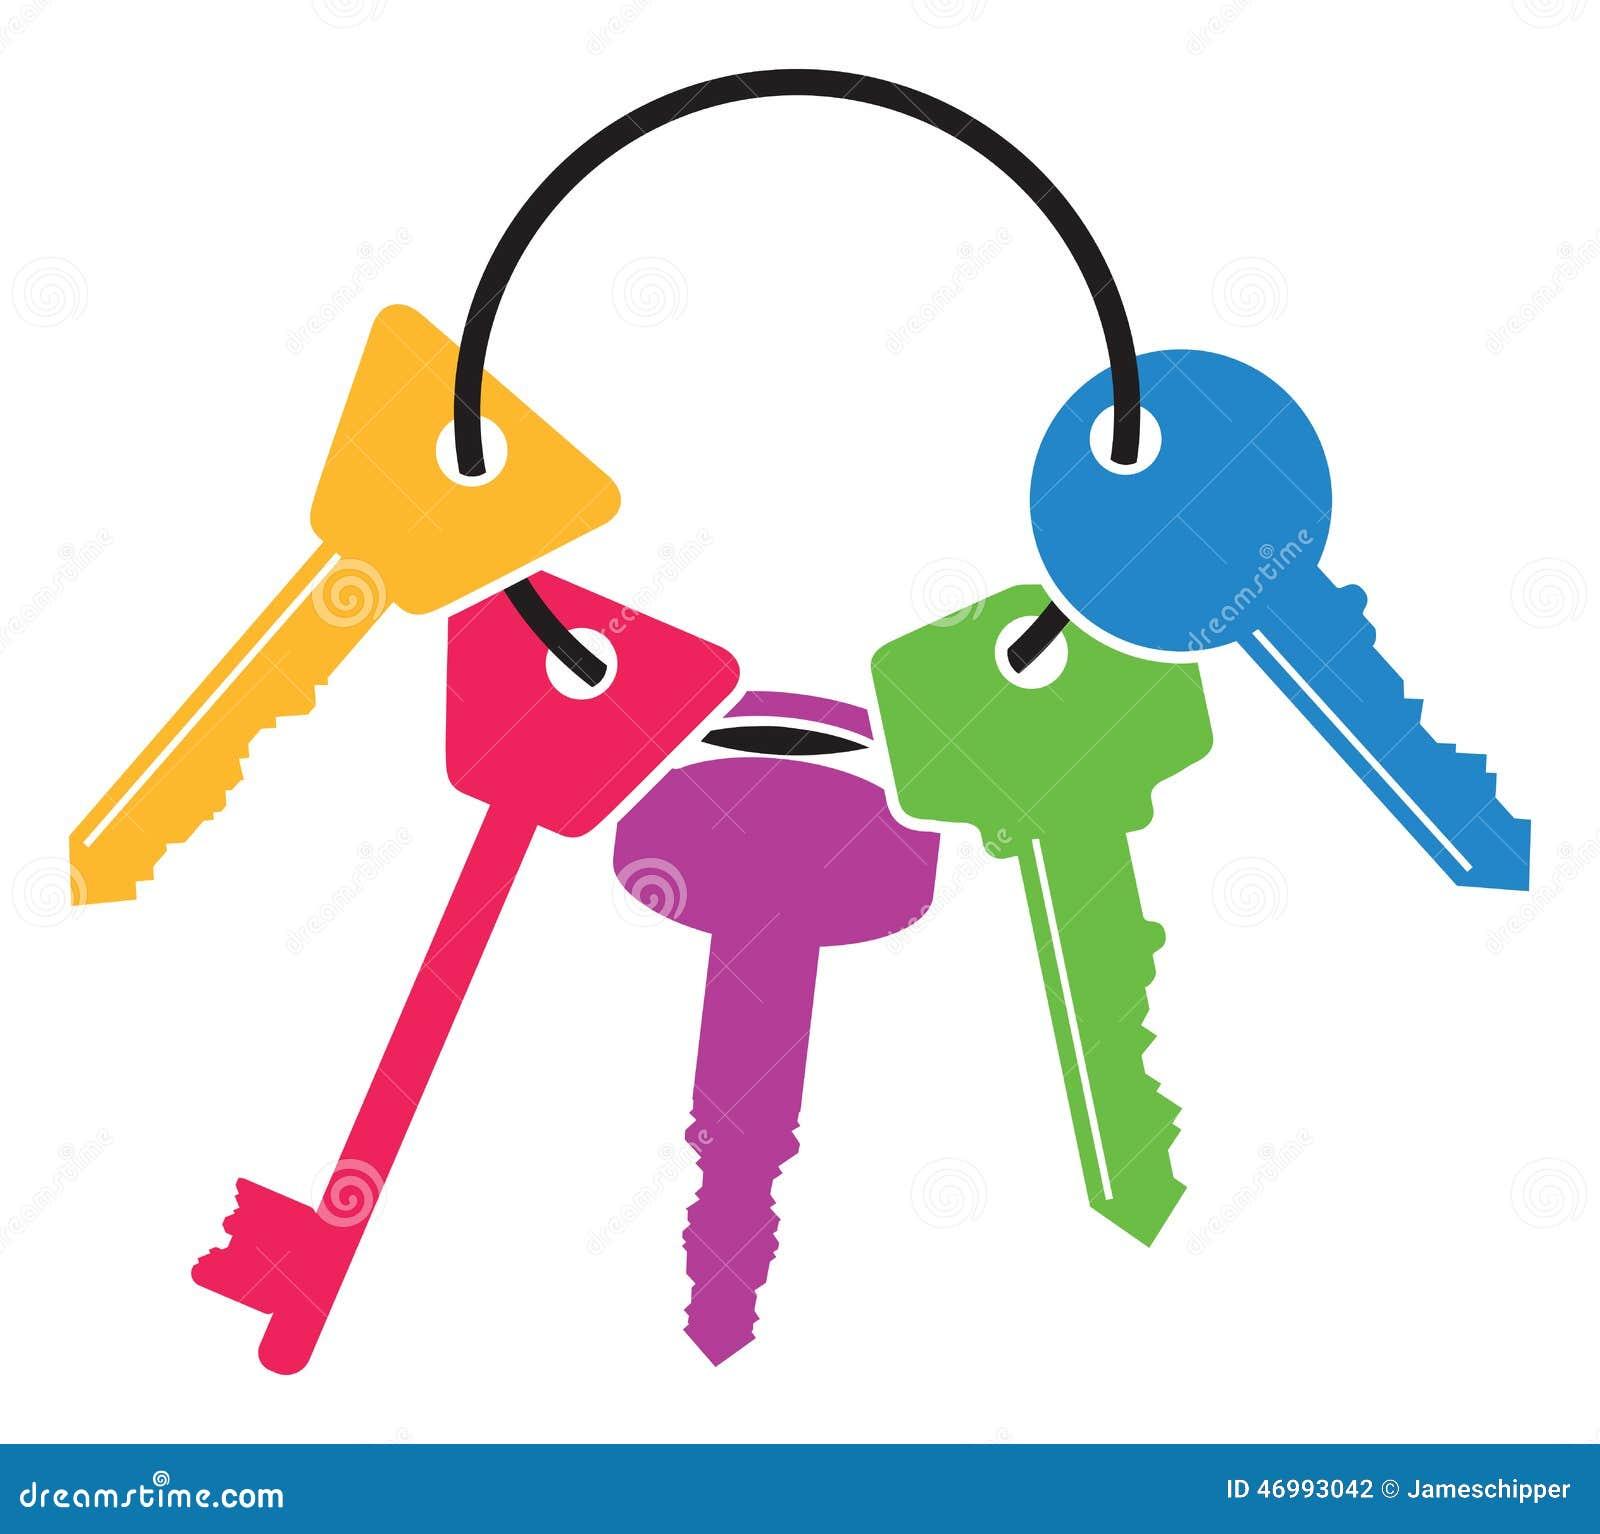 Vector Key Illustration: Colourful Set Of Keys Stock Vector. Illustration Of Image